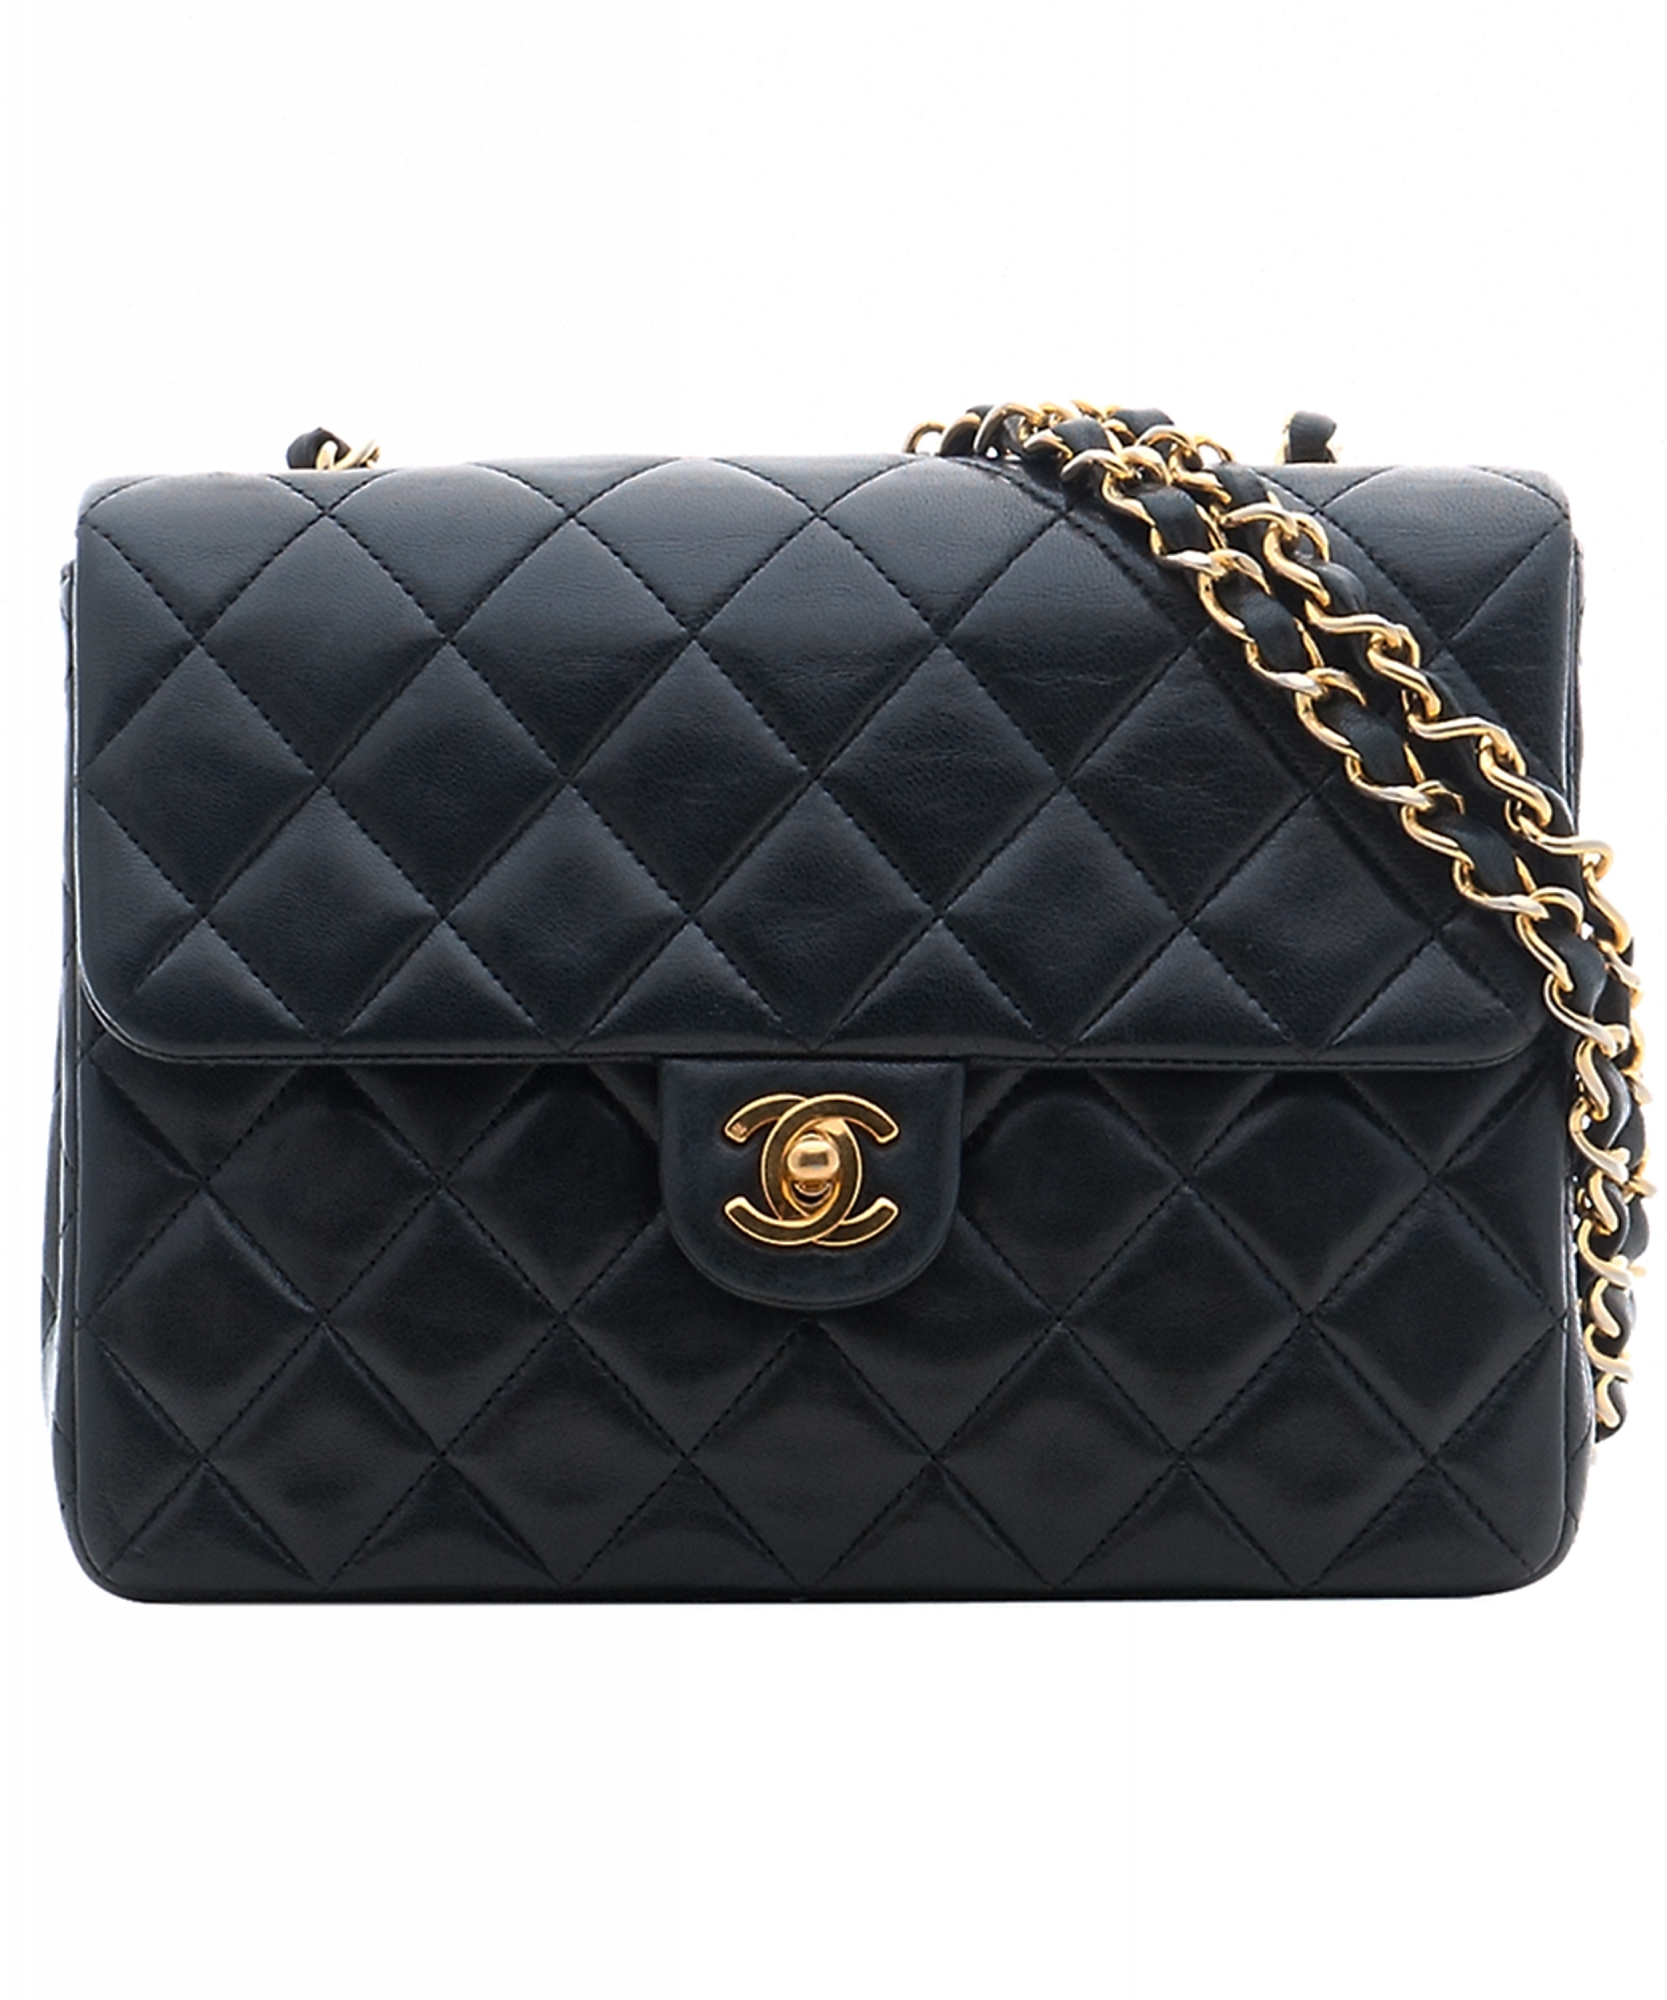 Chanel Handbag Black Leather Jaguar Clubs Of North America